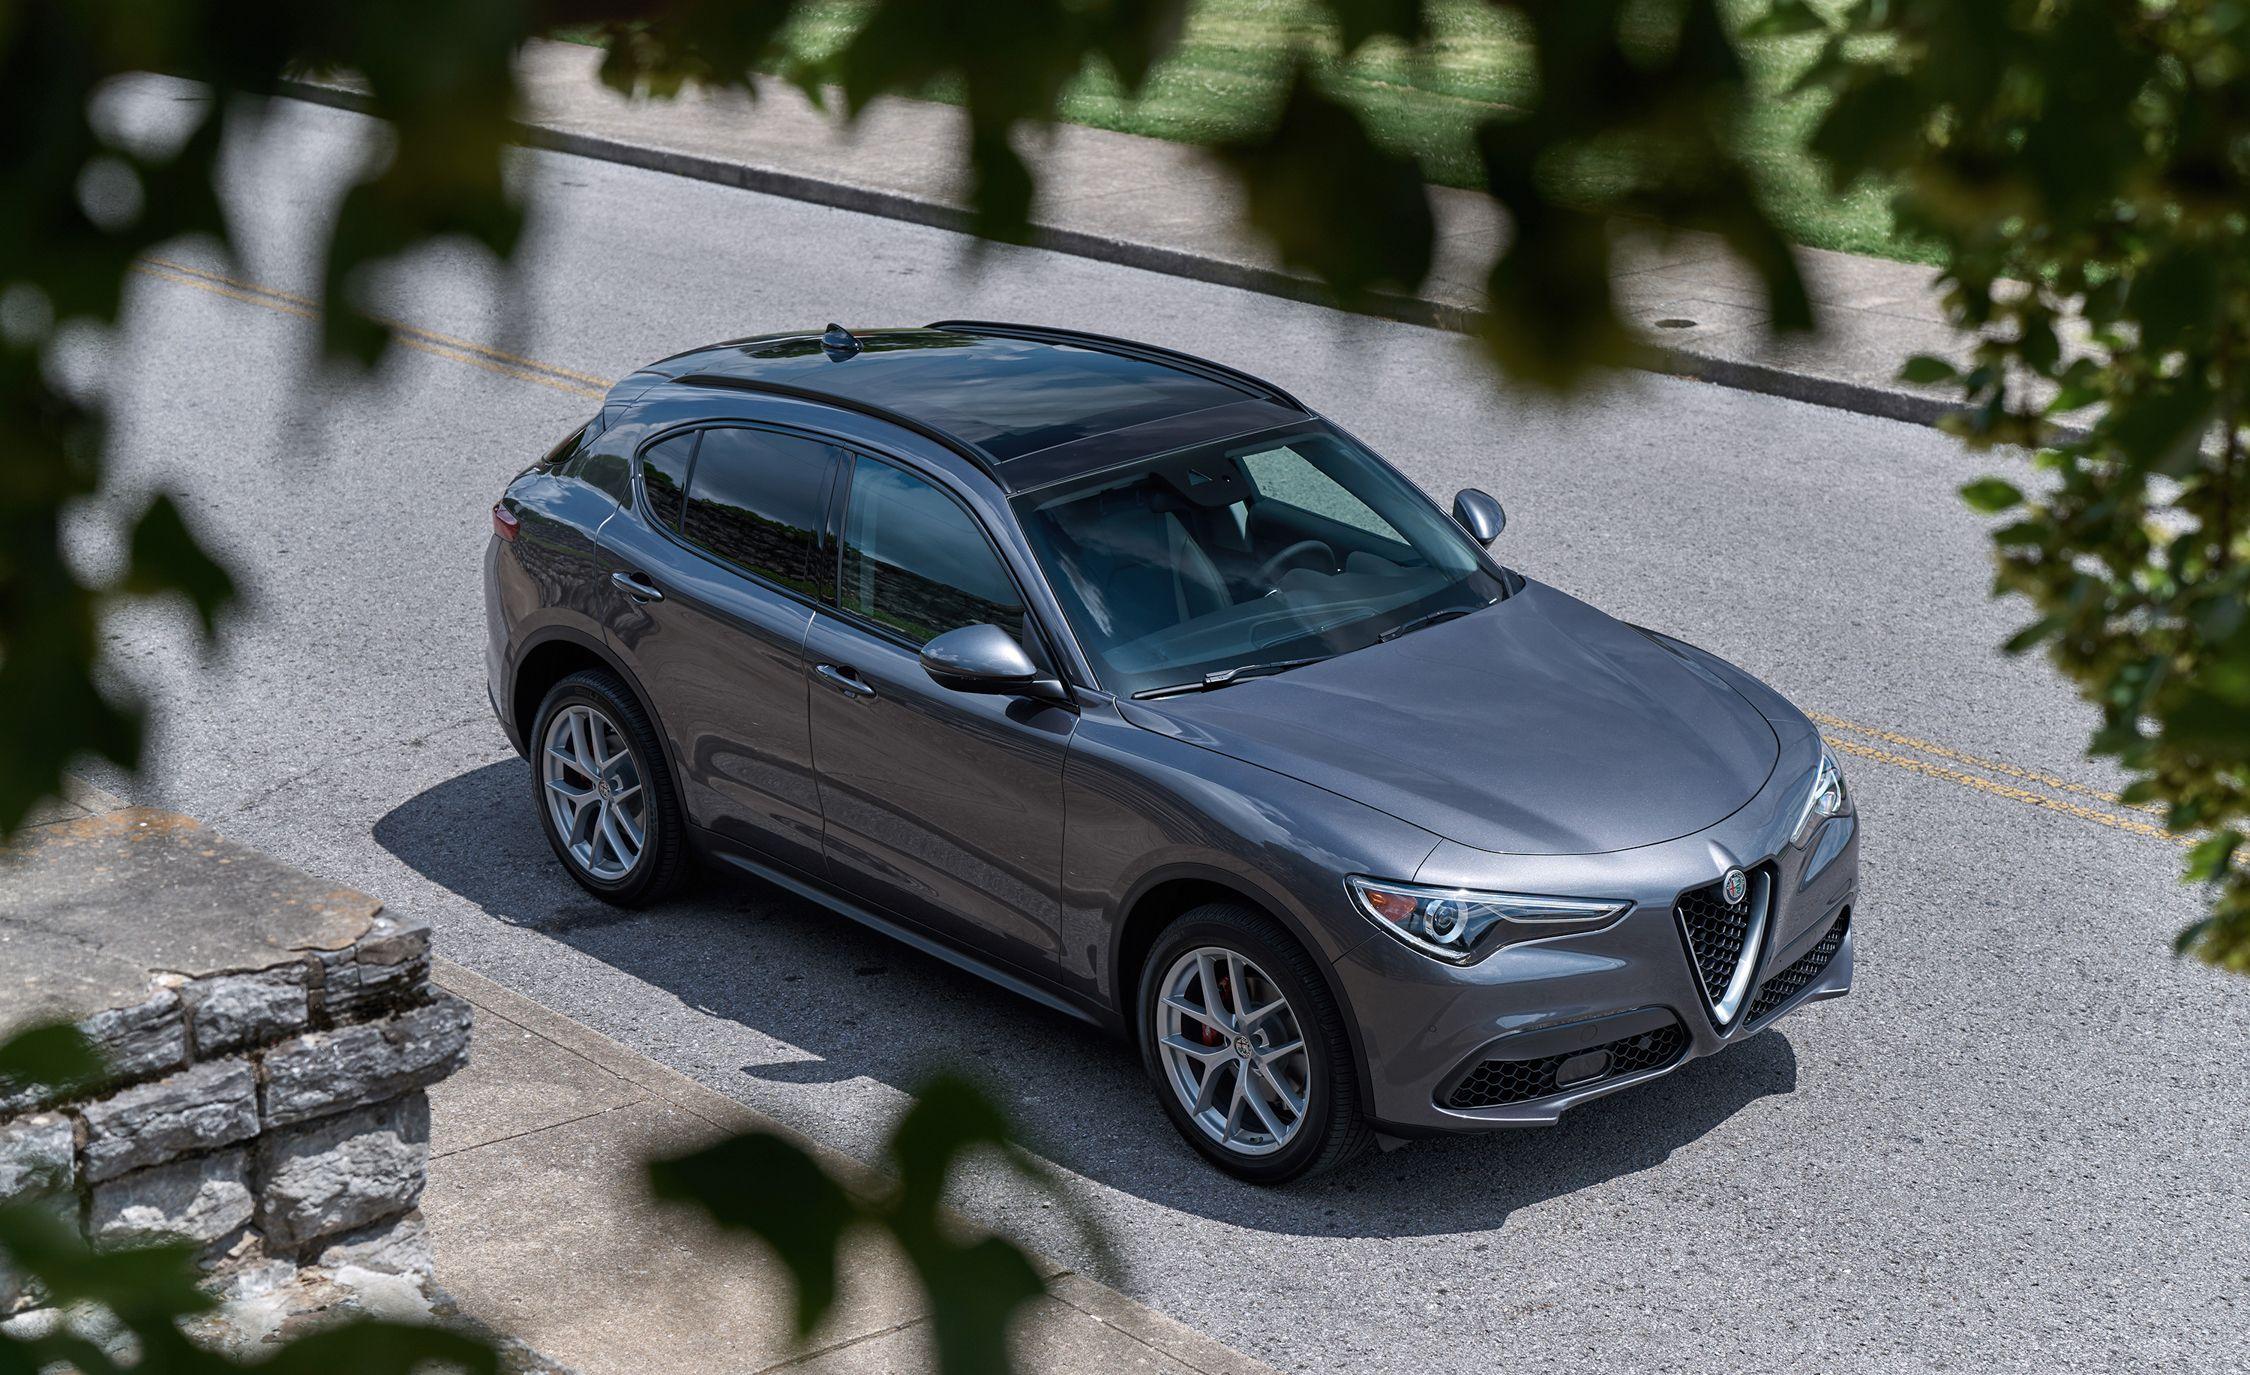 Alfa Romeo Stelvio Adds Cheaper RWD Variant for 2019